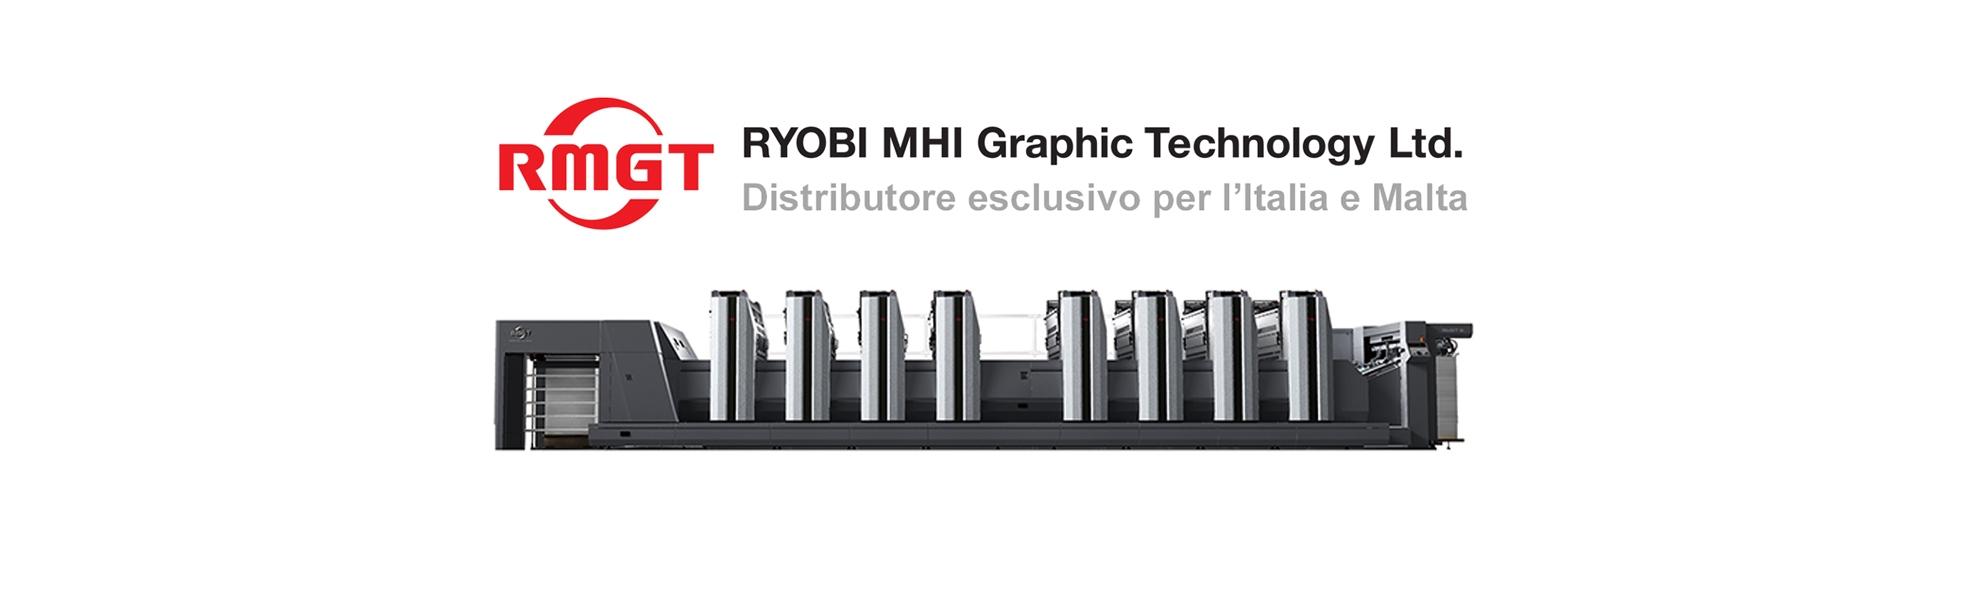 Distributore ufficiale RMGT RYOBI MHI Graphic Tecnology